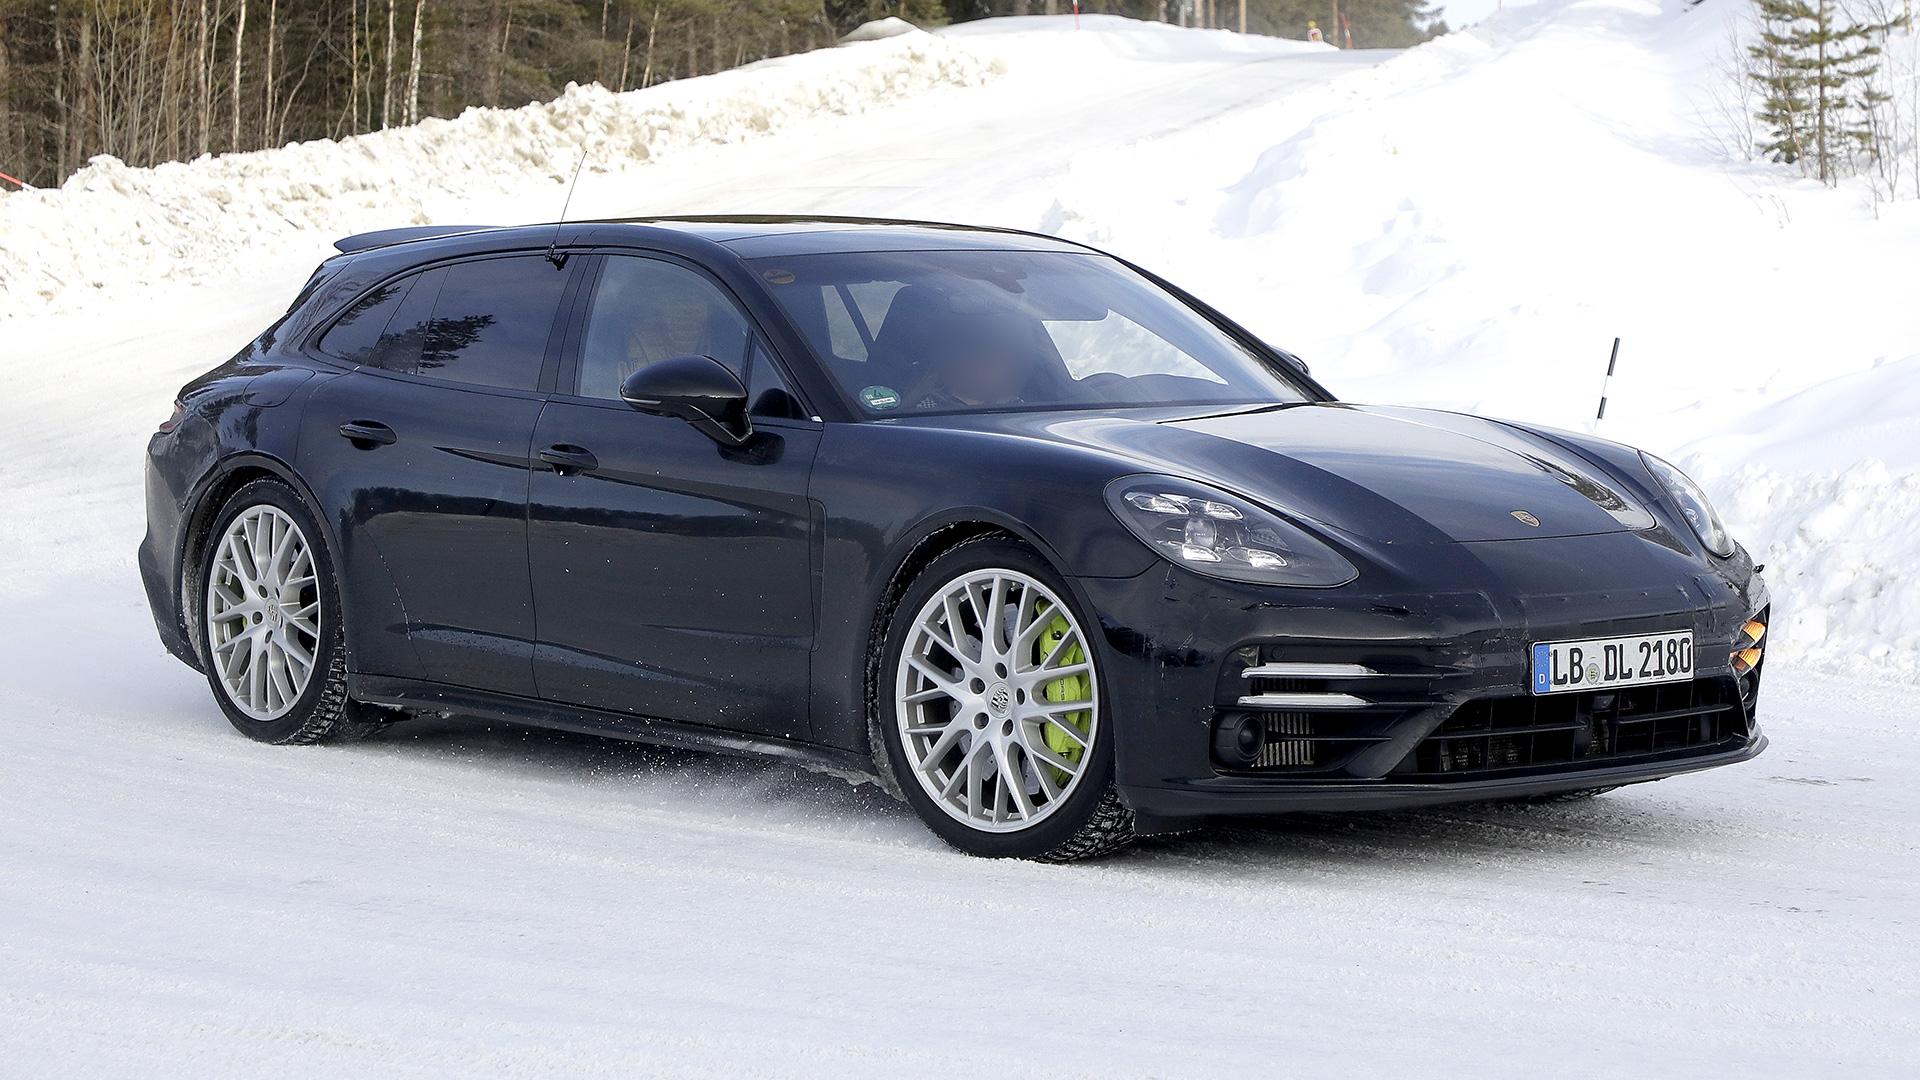 New 2020 Porsche Panamera Sport Turismo facelift spied